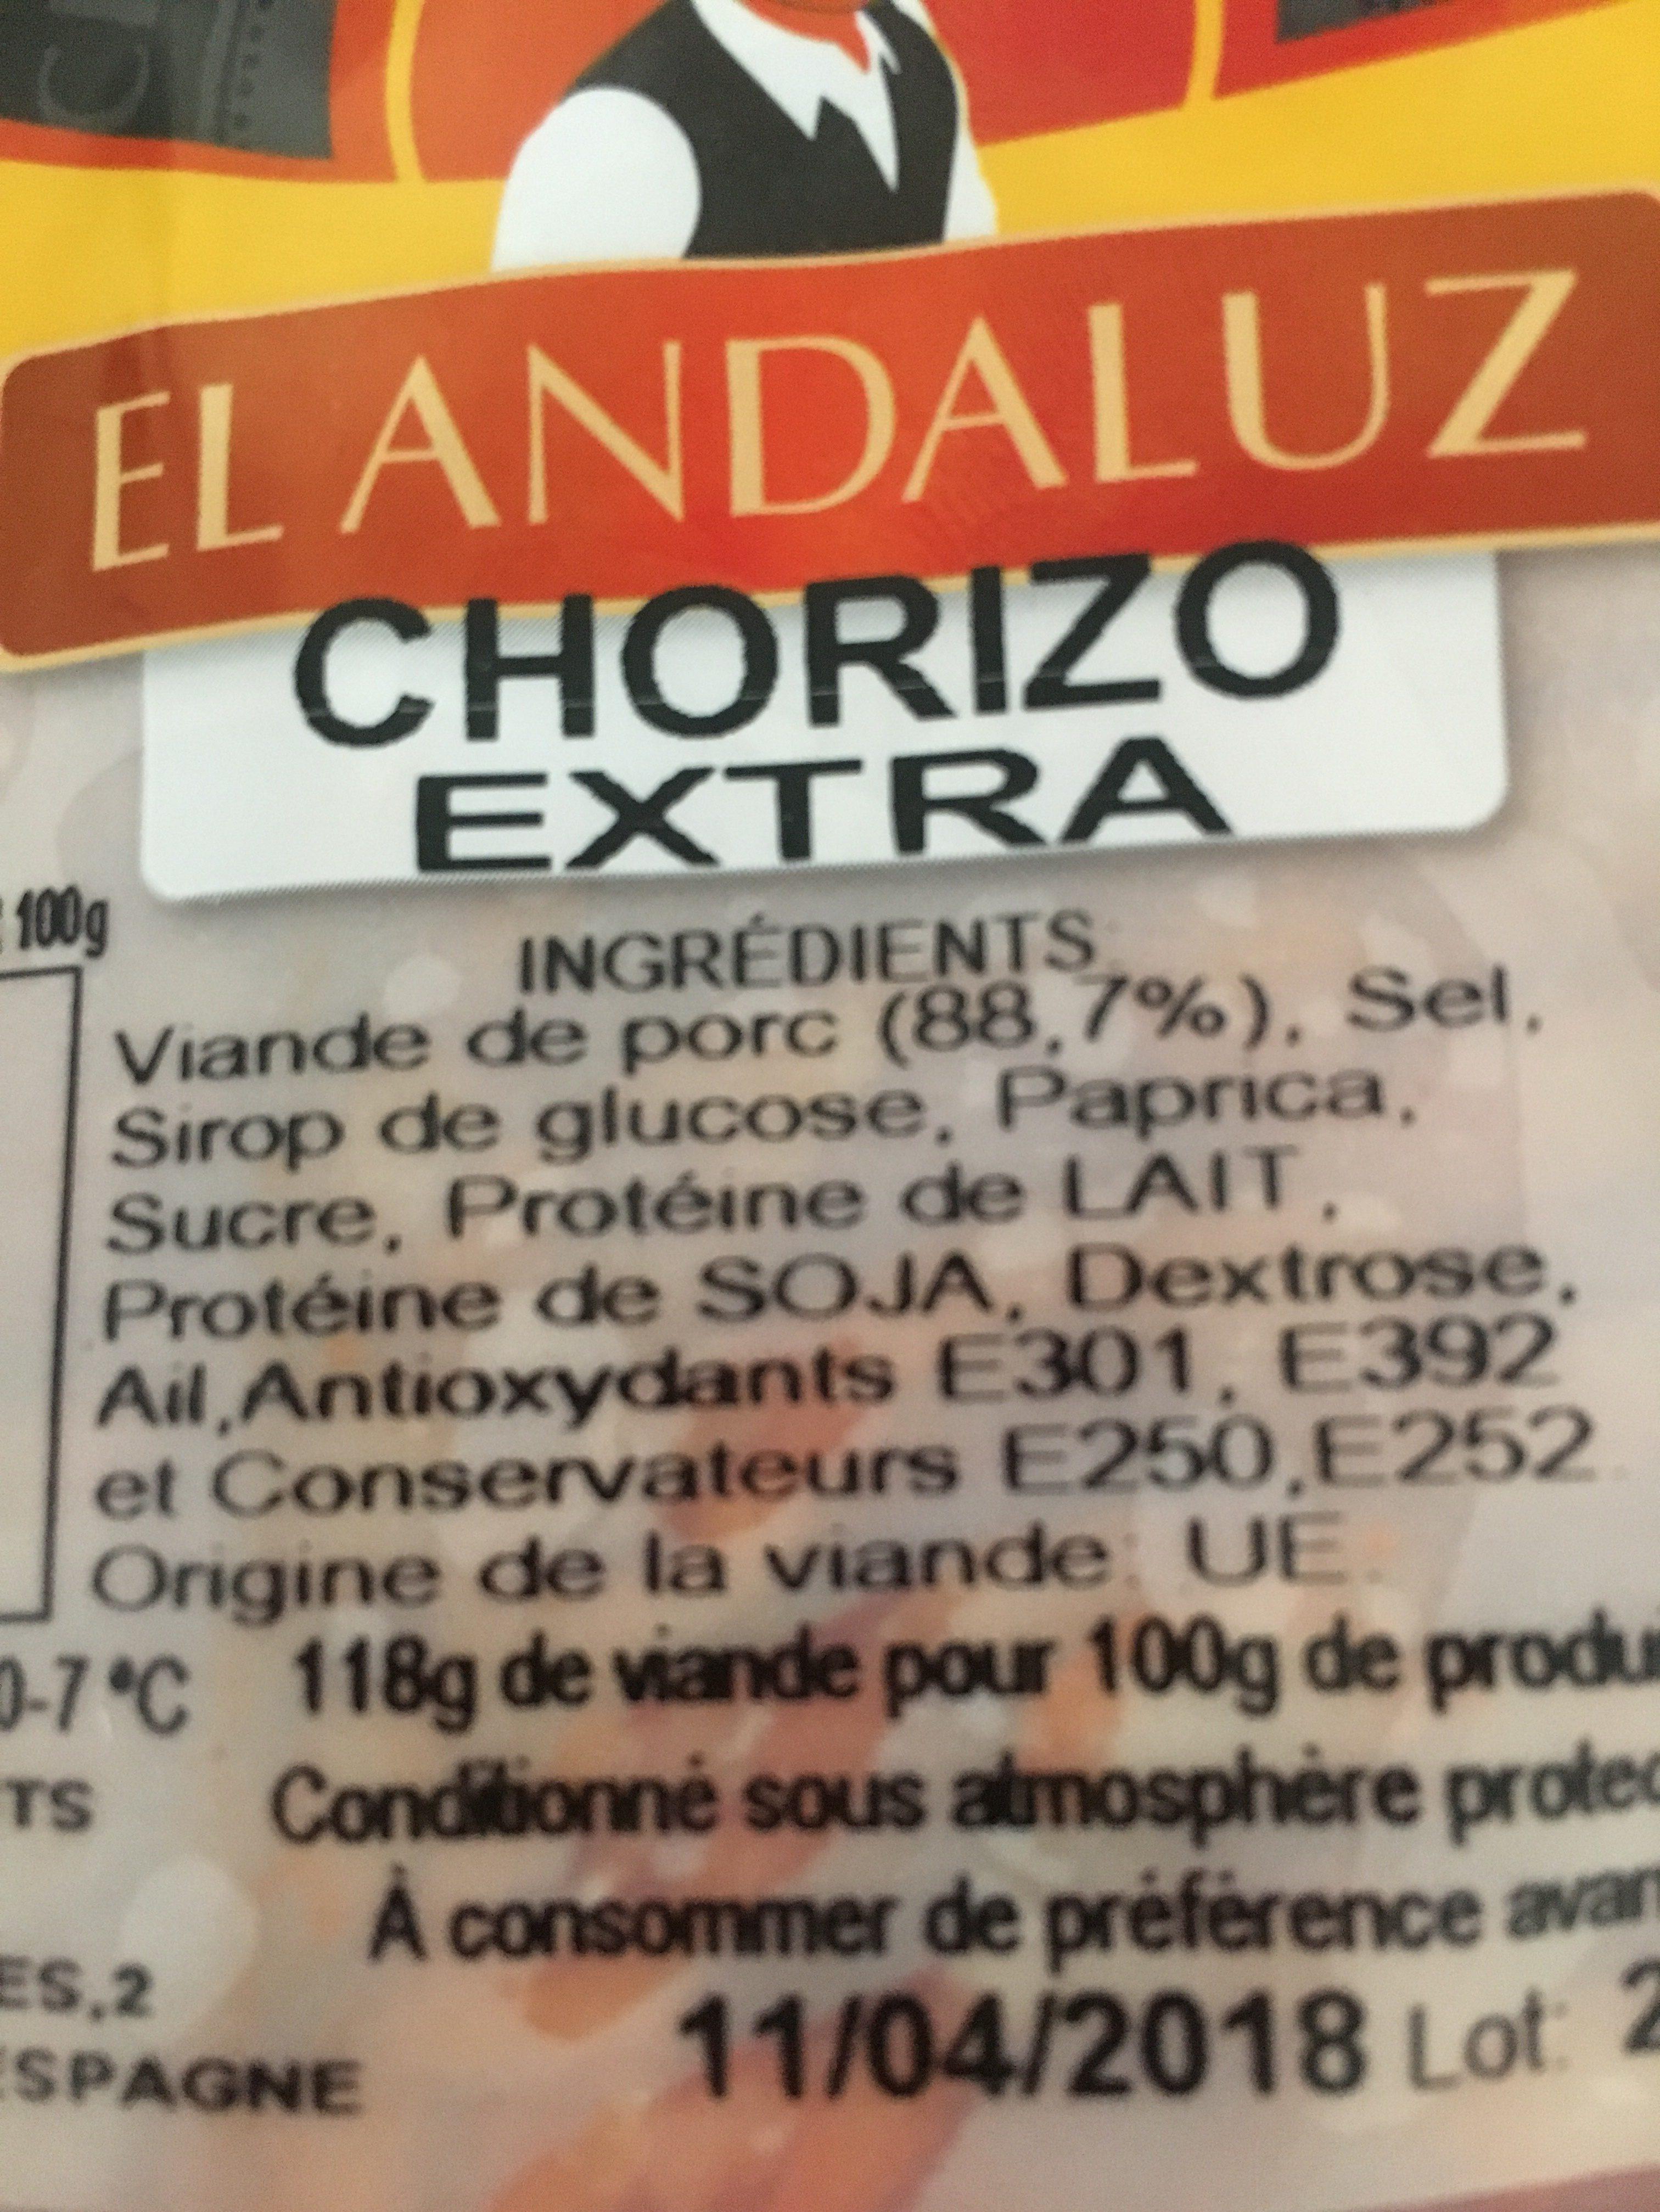 Chorizo extra - Ingrédients